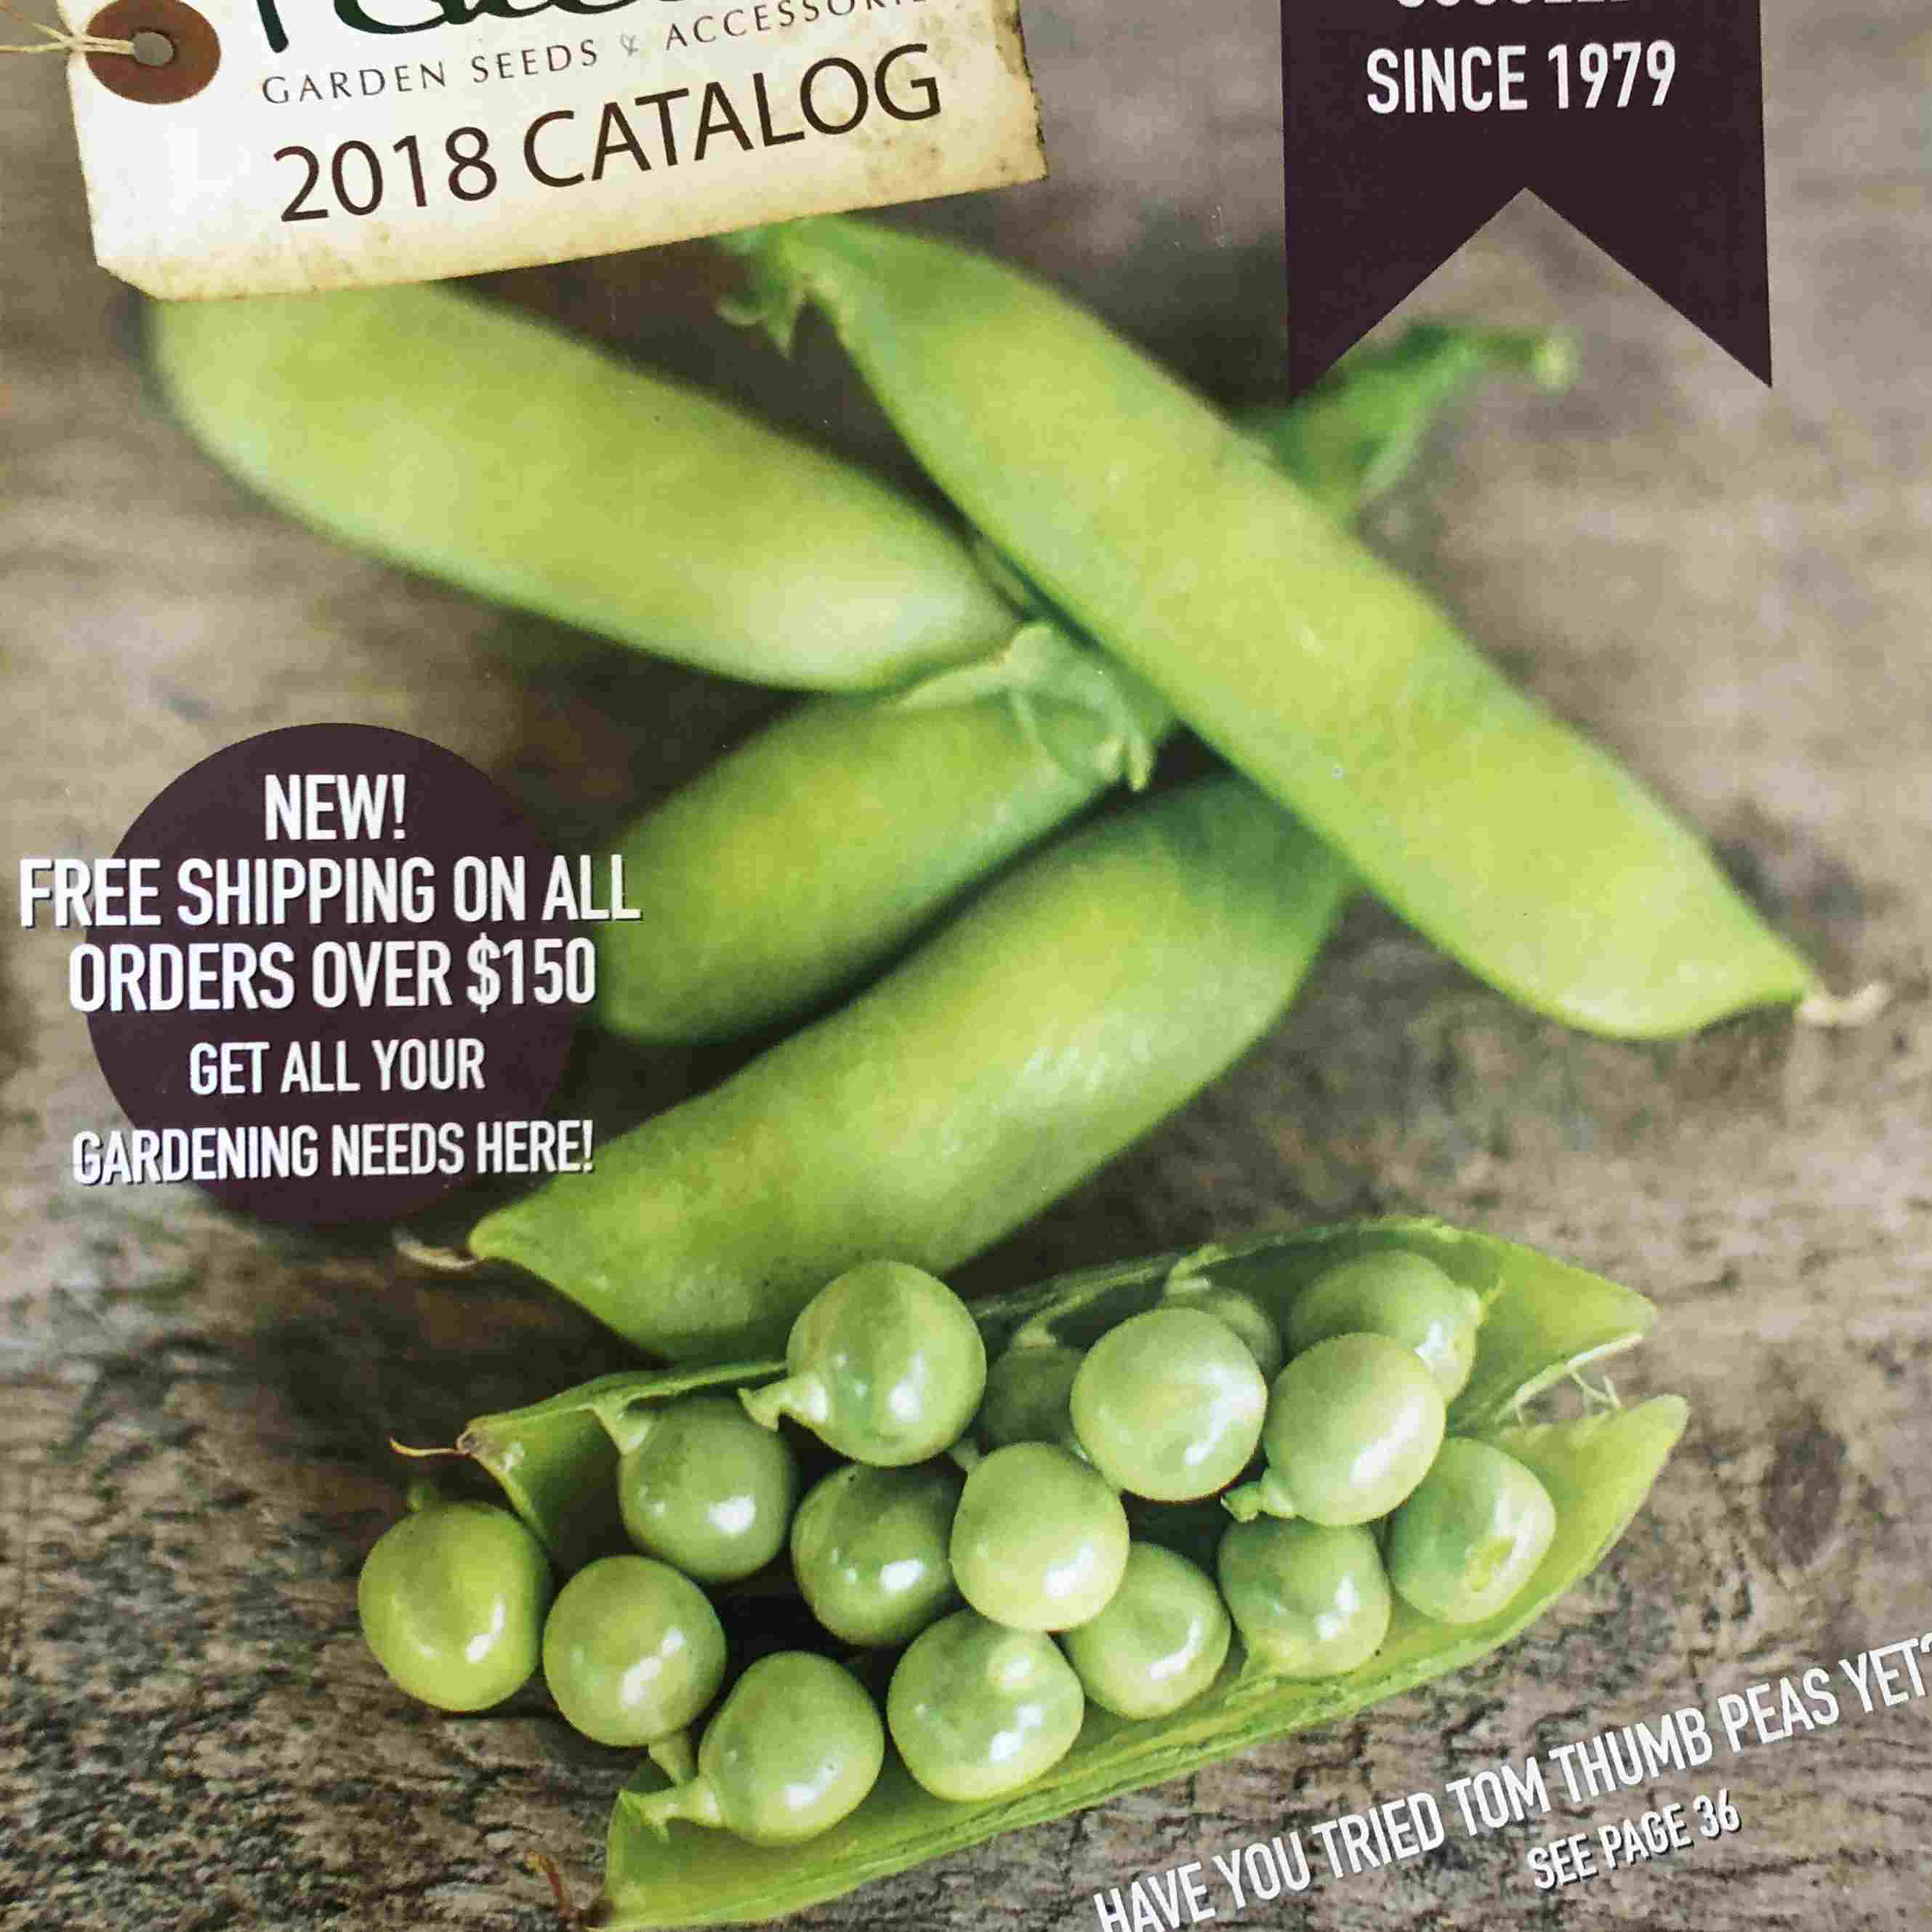 El catálogo de semillas The Pinetree Garden Seeds 2018